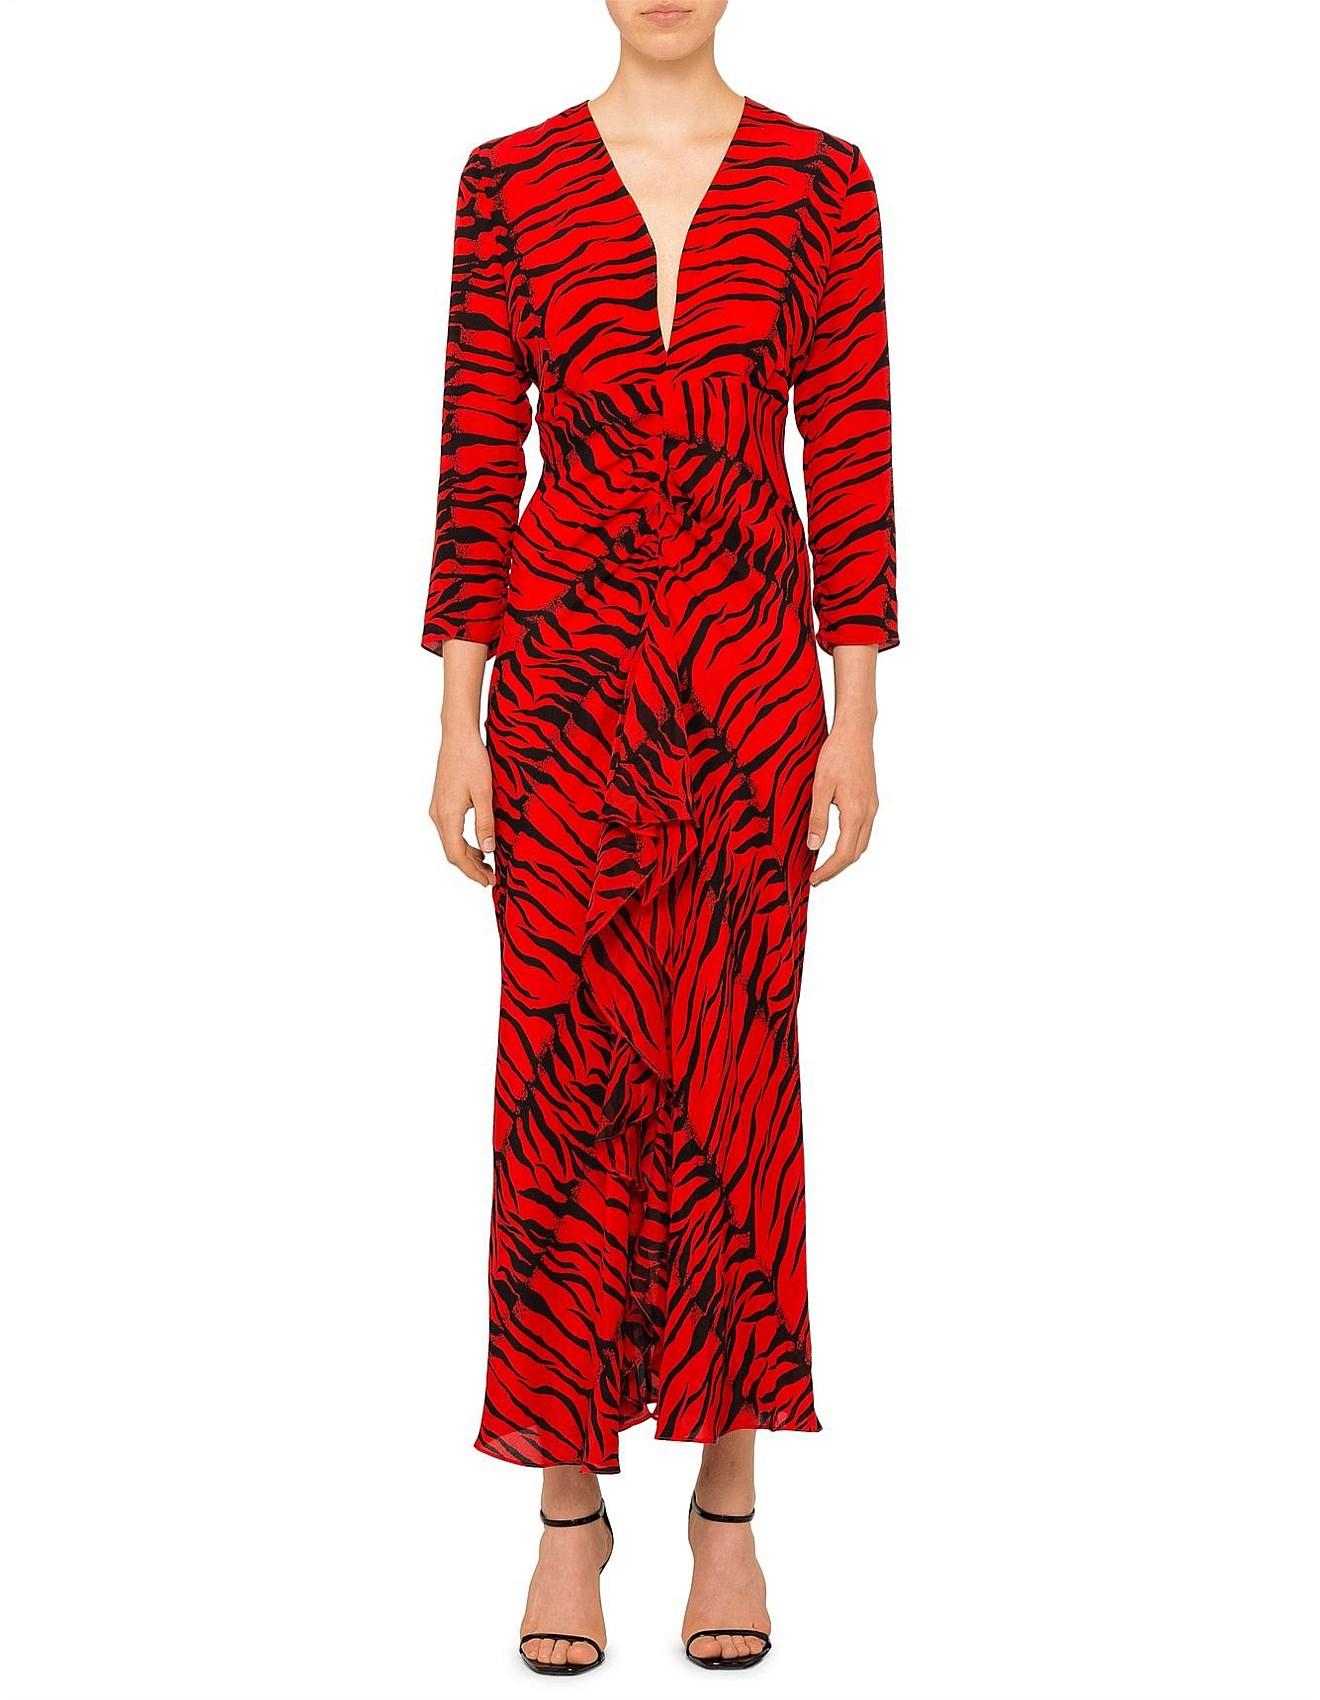 917a2752cf17 Women's Dresses   Designer Women's Dresses Online   David Jones - ROSE LONG  SLEEVE V NECK MAXI DRESS